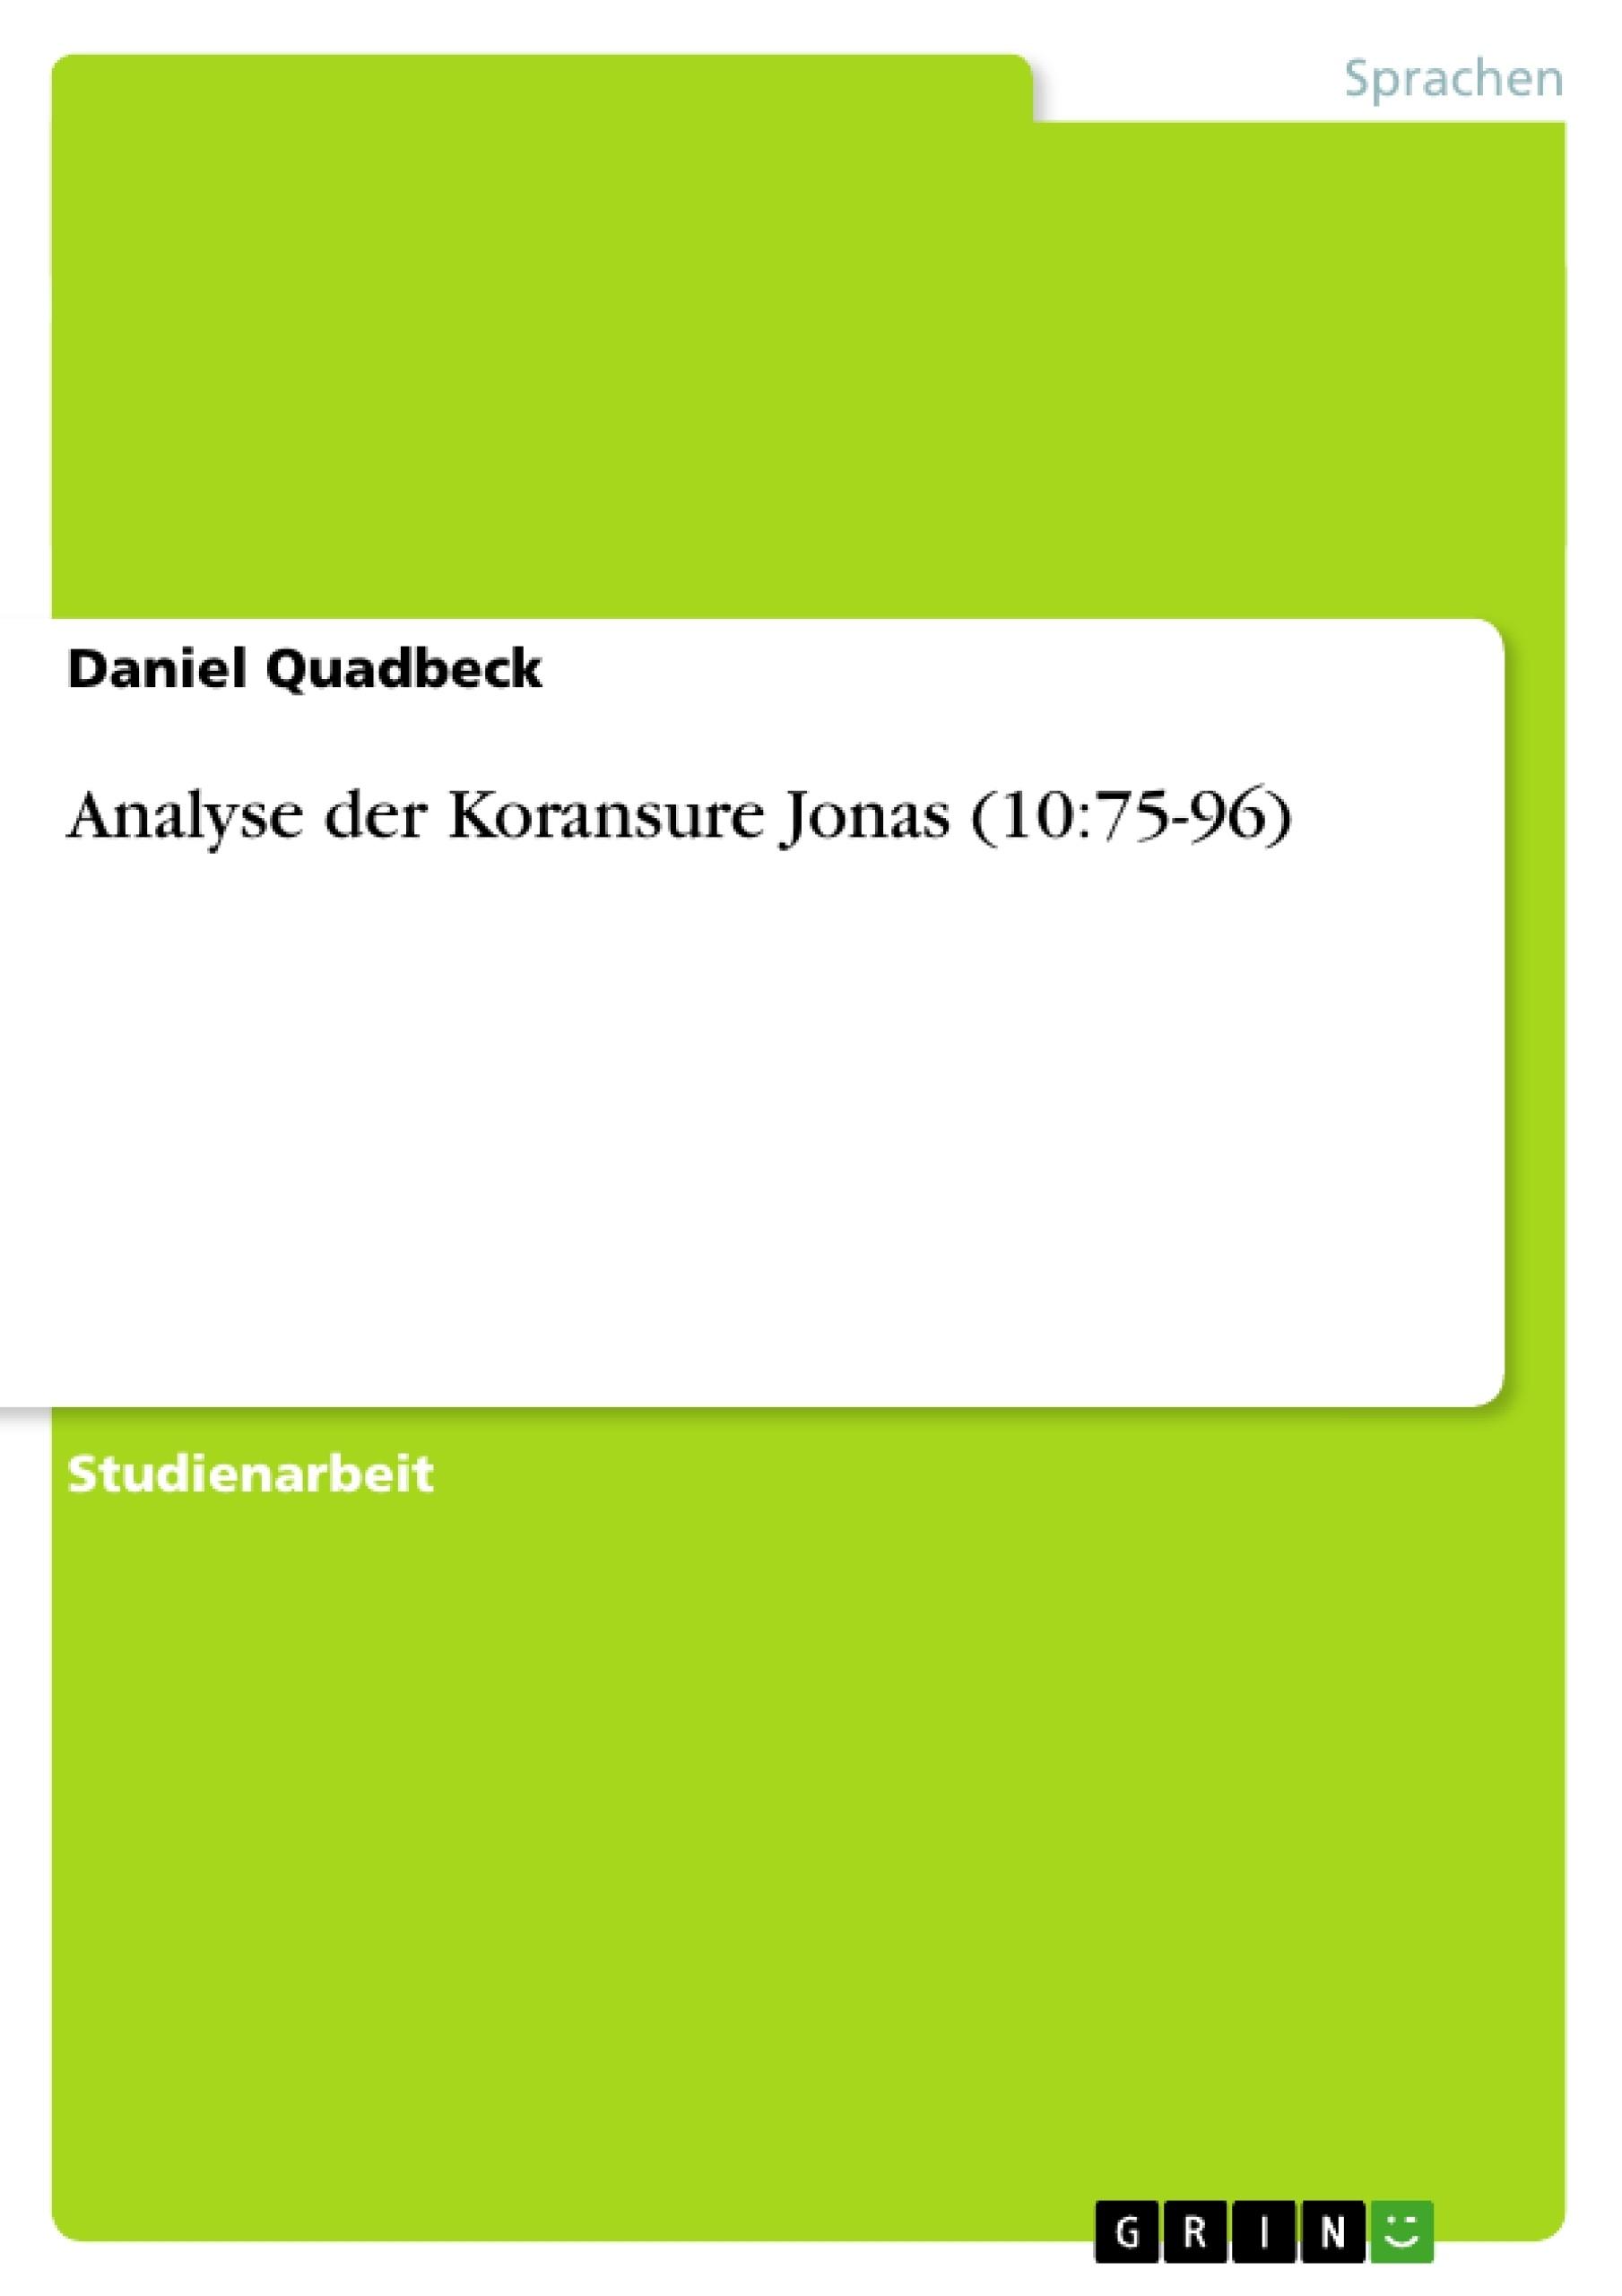 Titel: Analyse der Koransure Jonas (10:75-96)